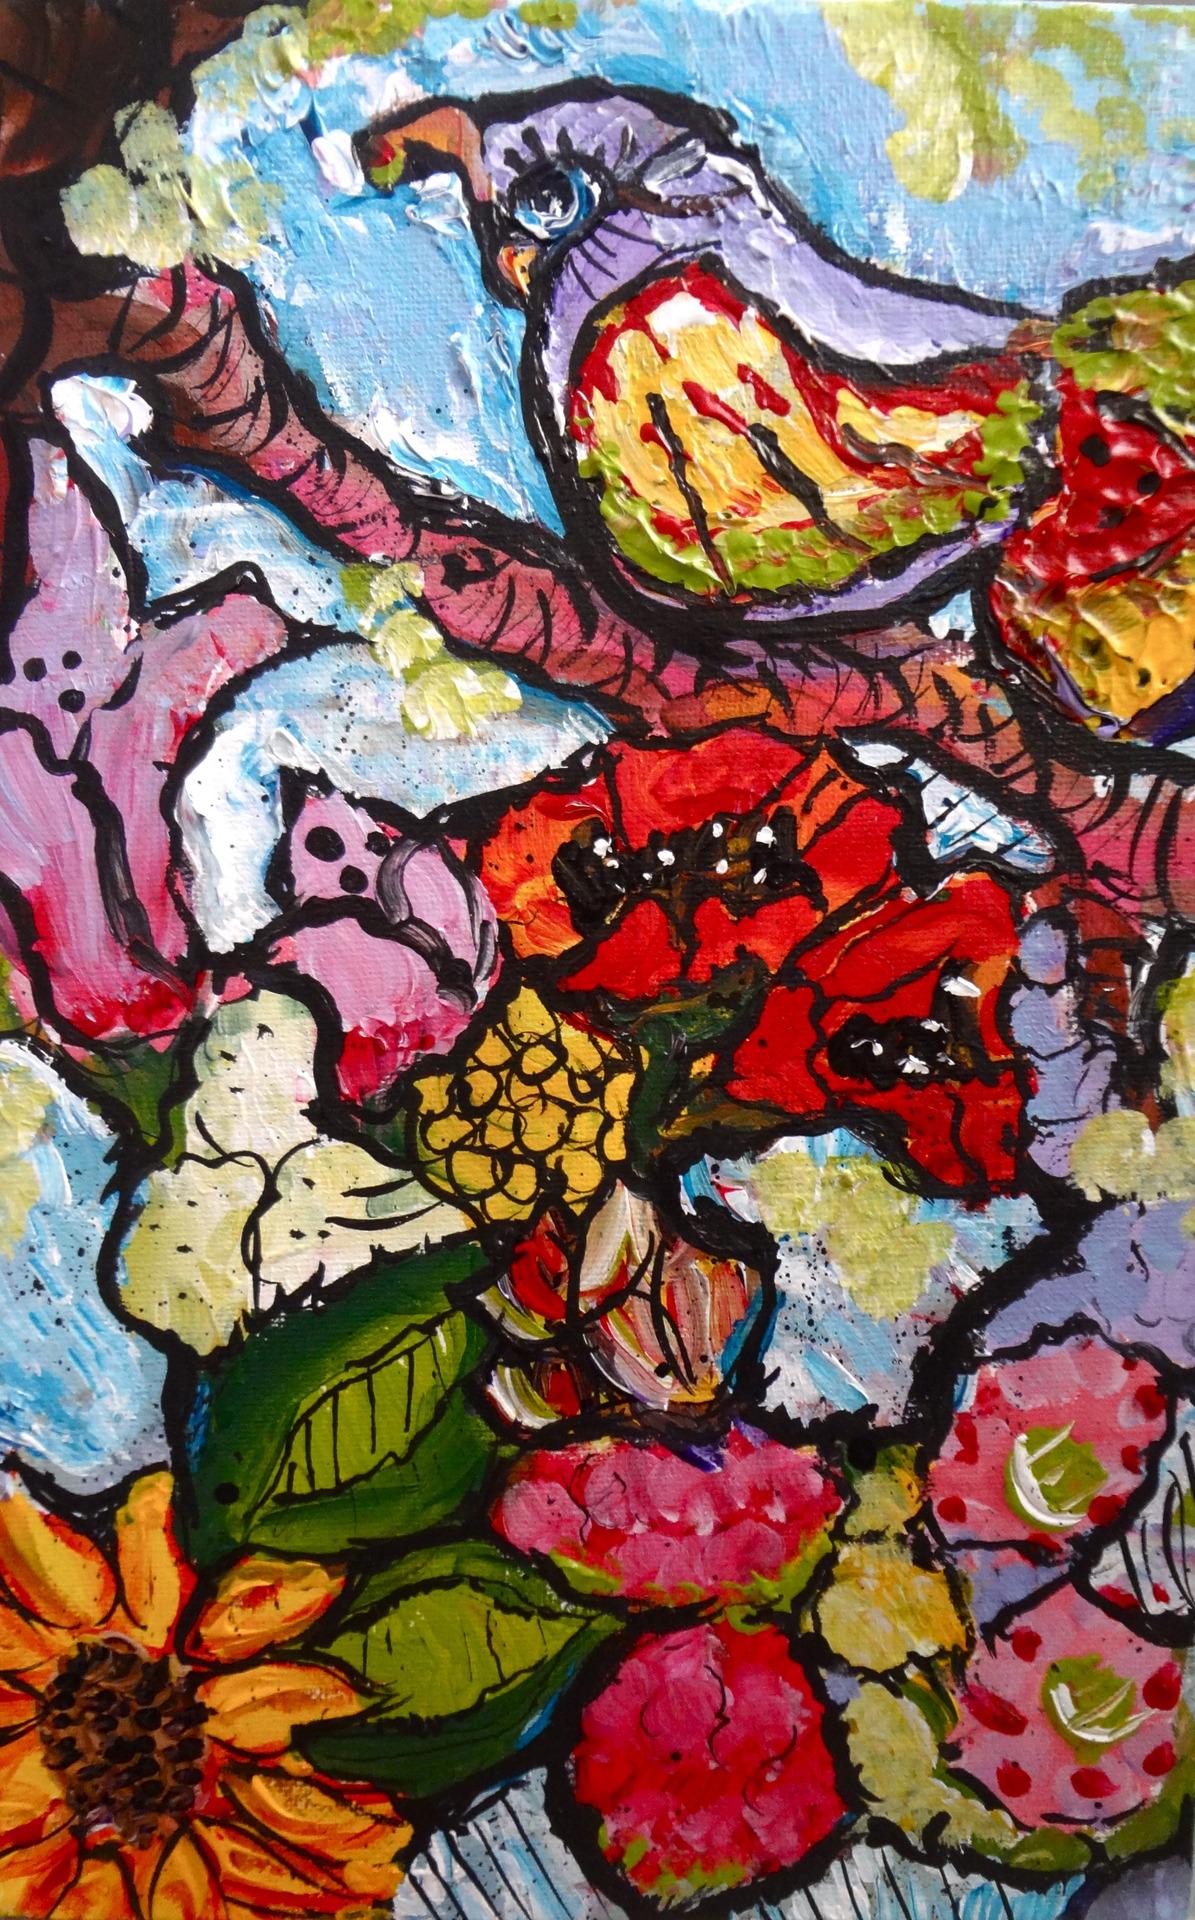 "Bird on a Branch/ Acrylic on Canvas/9x12""/ July 2012"